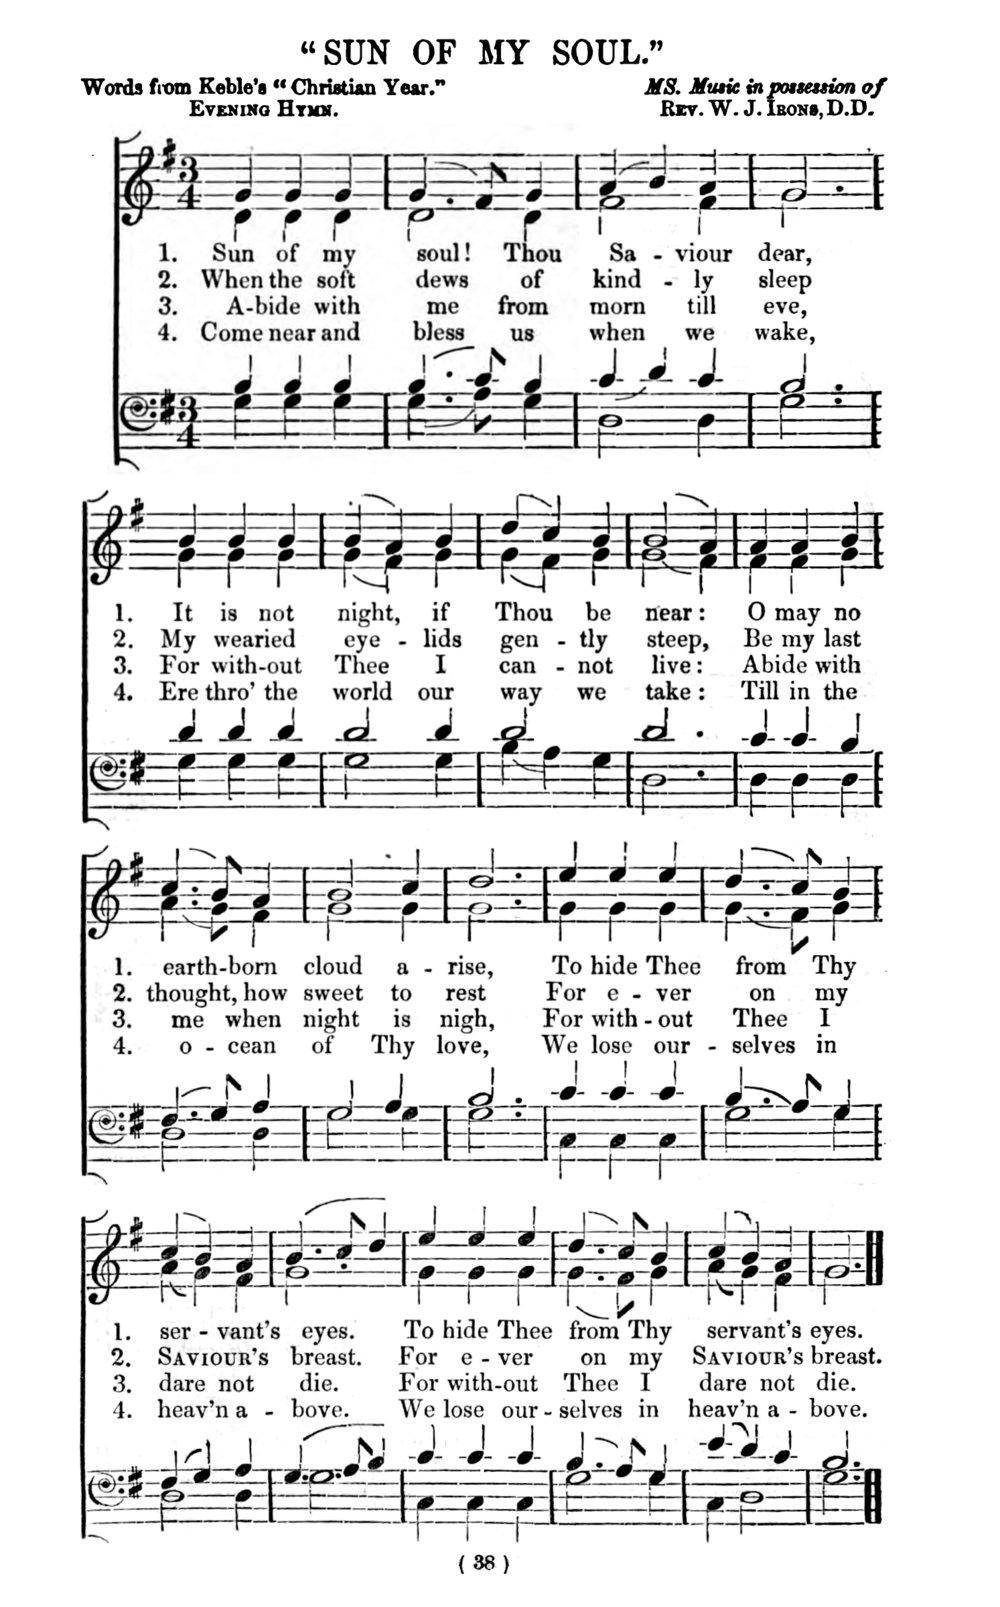 Fig. 2.   The Metrical Psalter,  ed.William Irons & Henry Lahee (London: Novello, 1855).